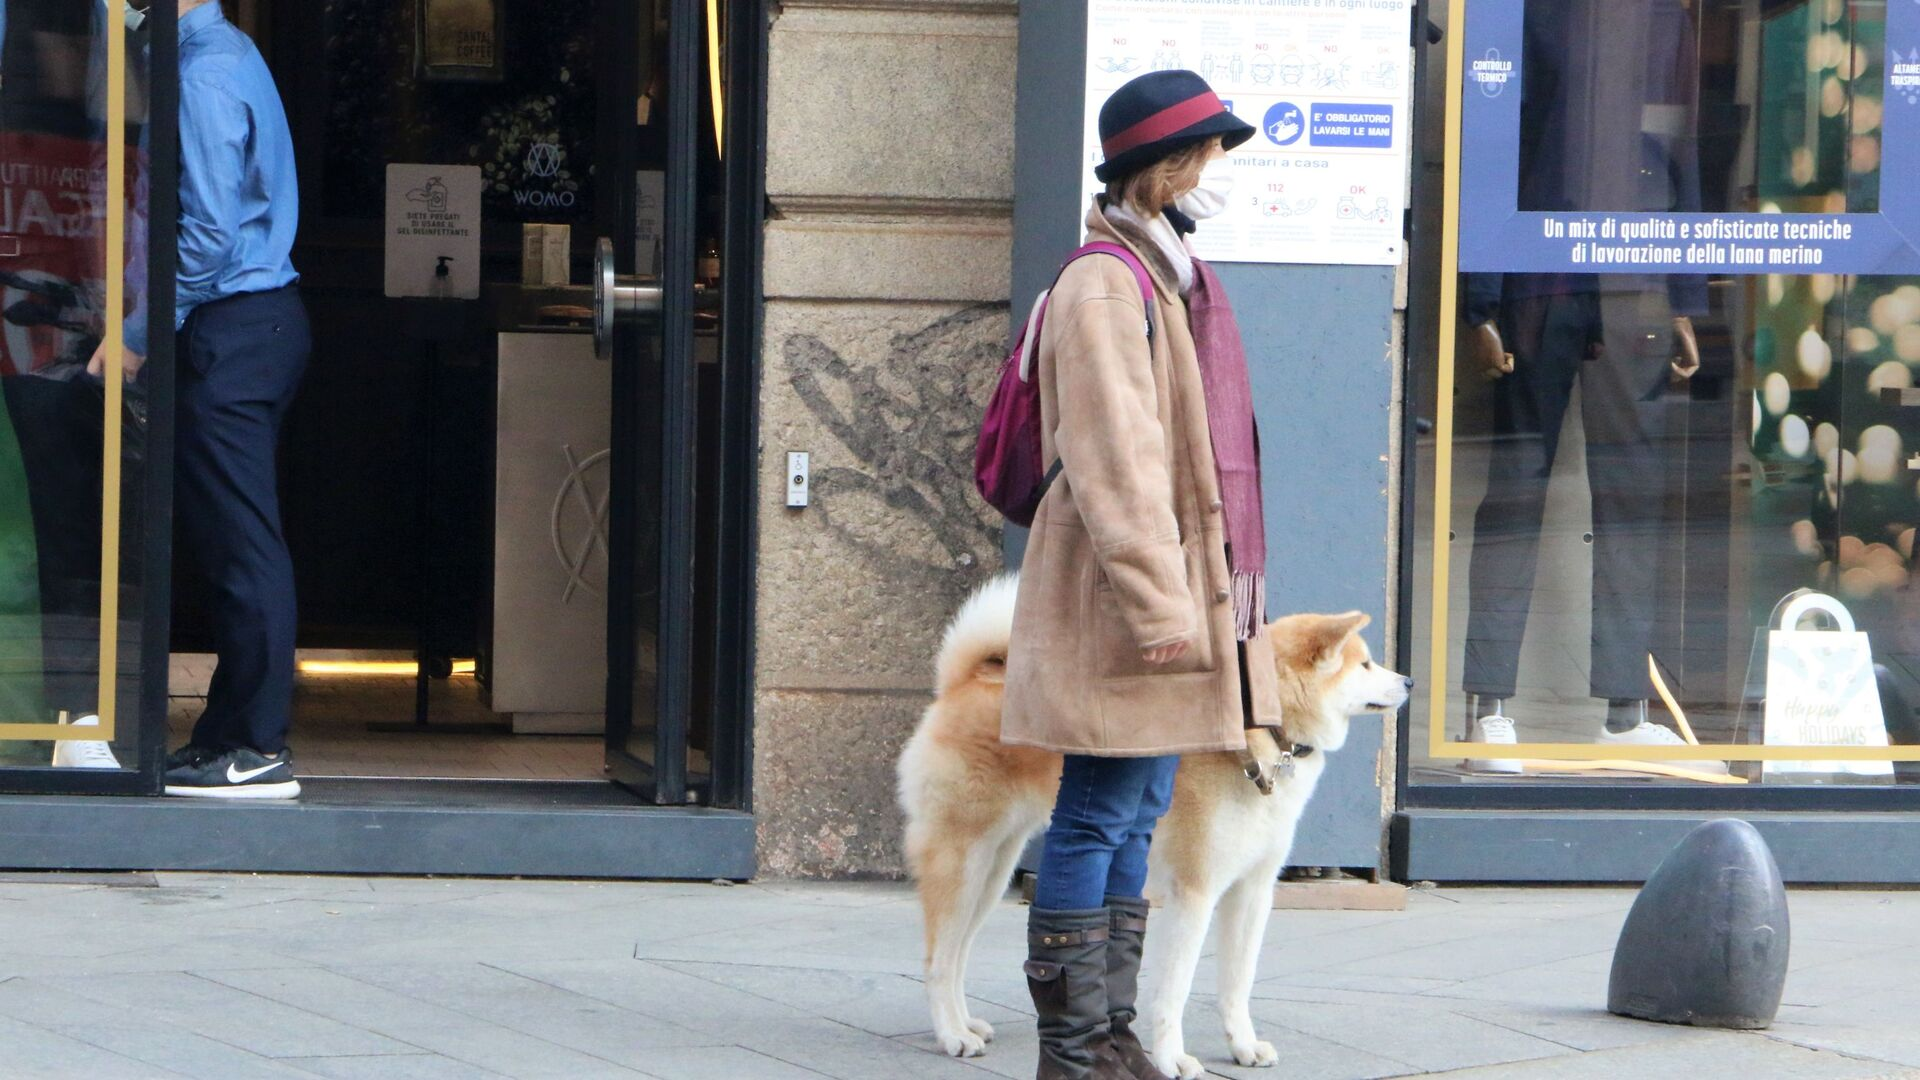 Una donna in mascherina con un cane - Sputnik Italia, 1920, 03.02.2021